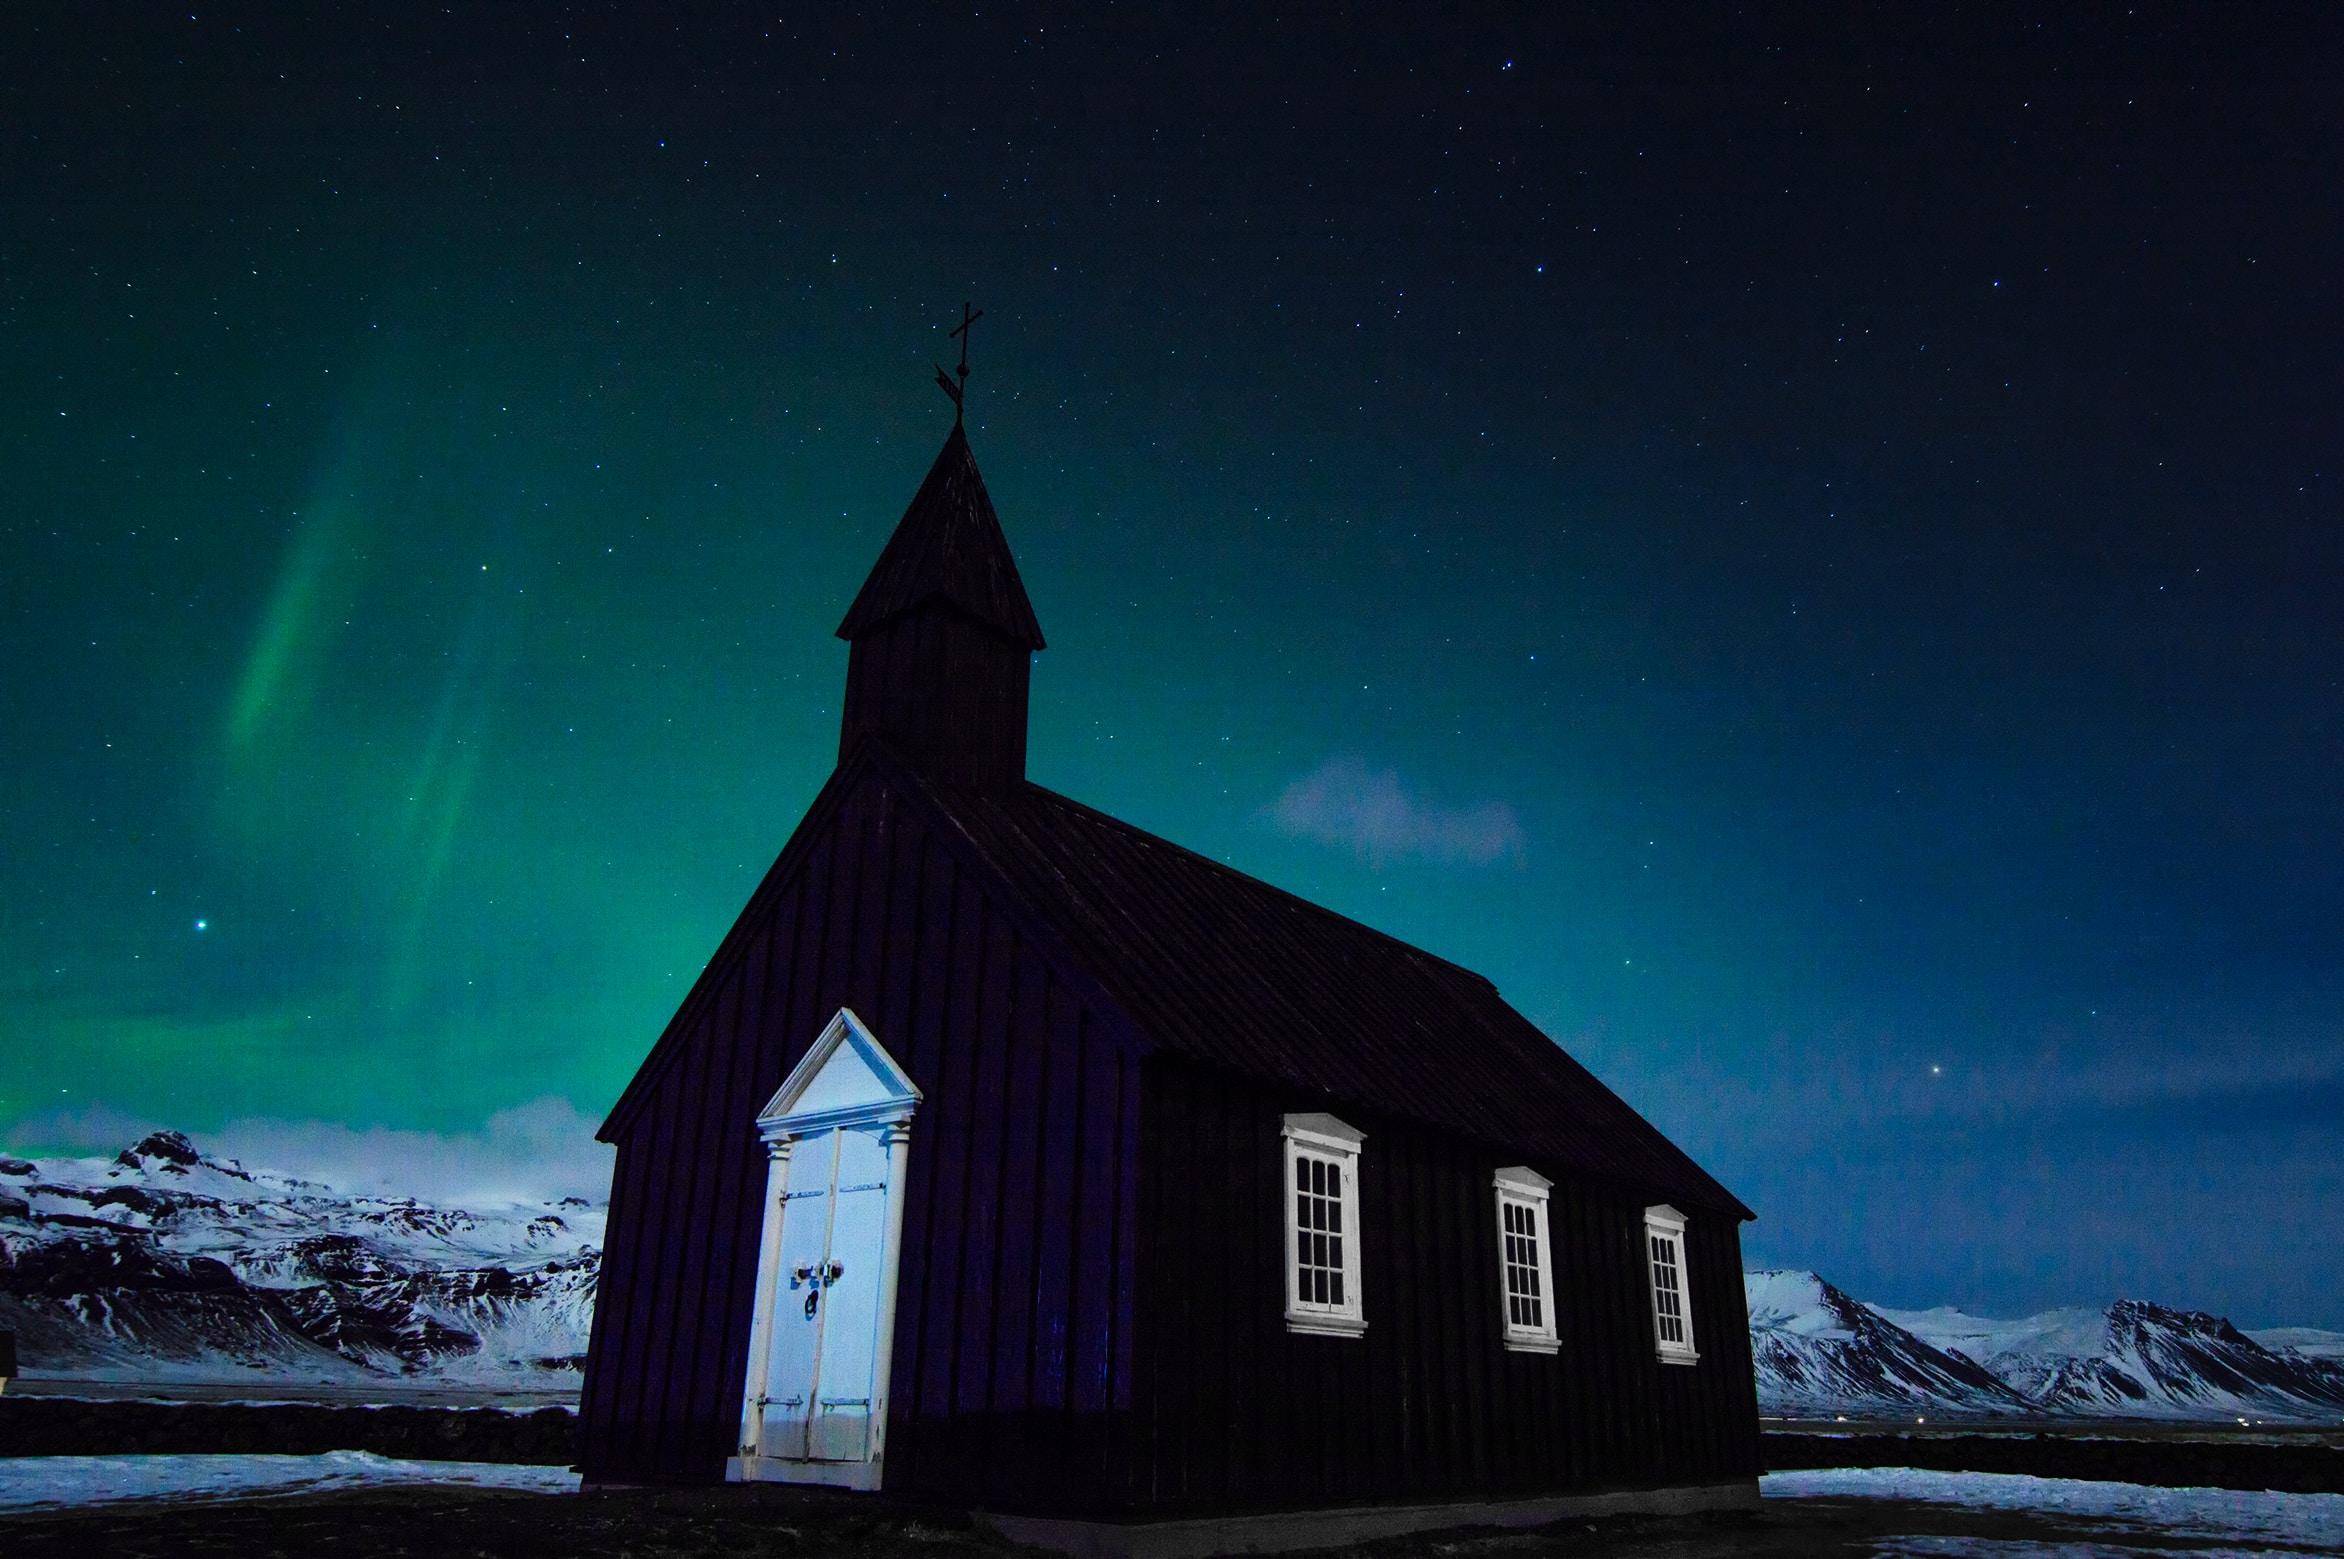 The Buðir Black Church overlooks the ocean on Iceland's Snæfellsnes Peninsula.